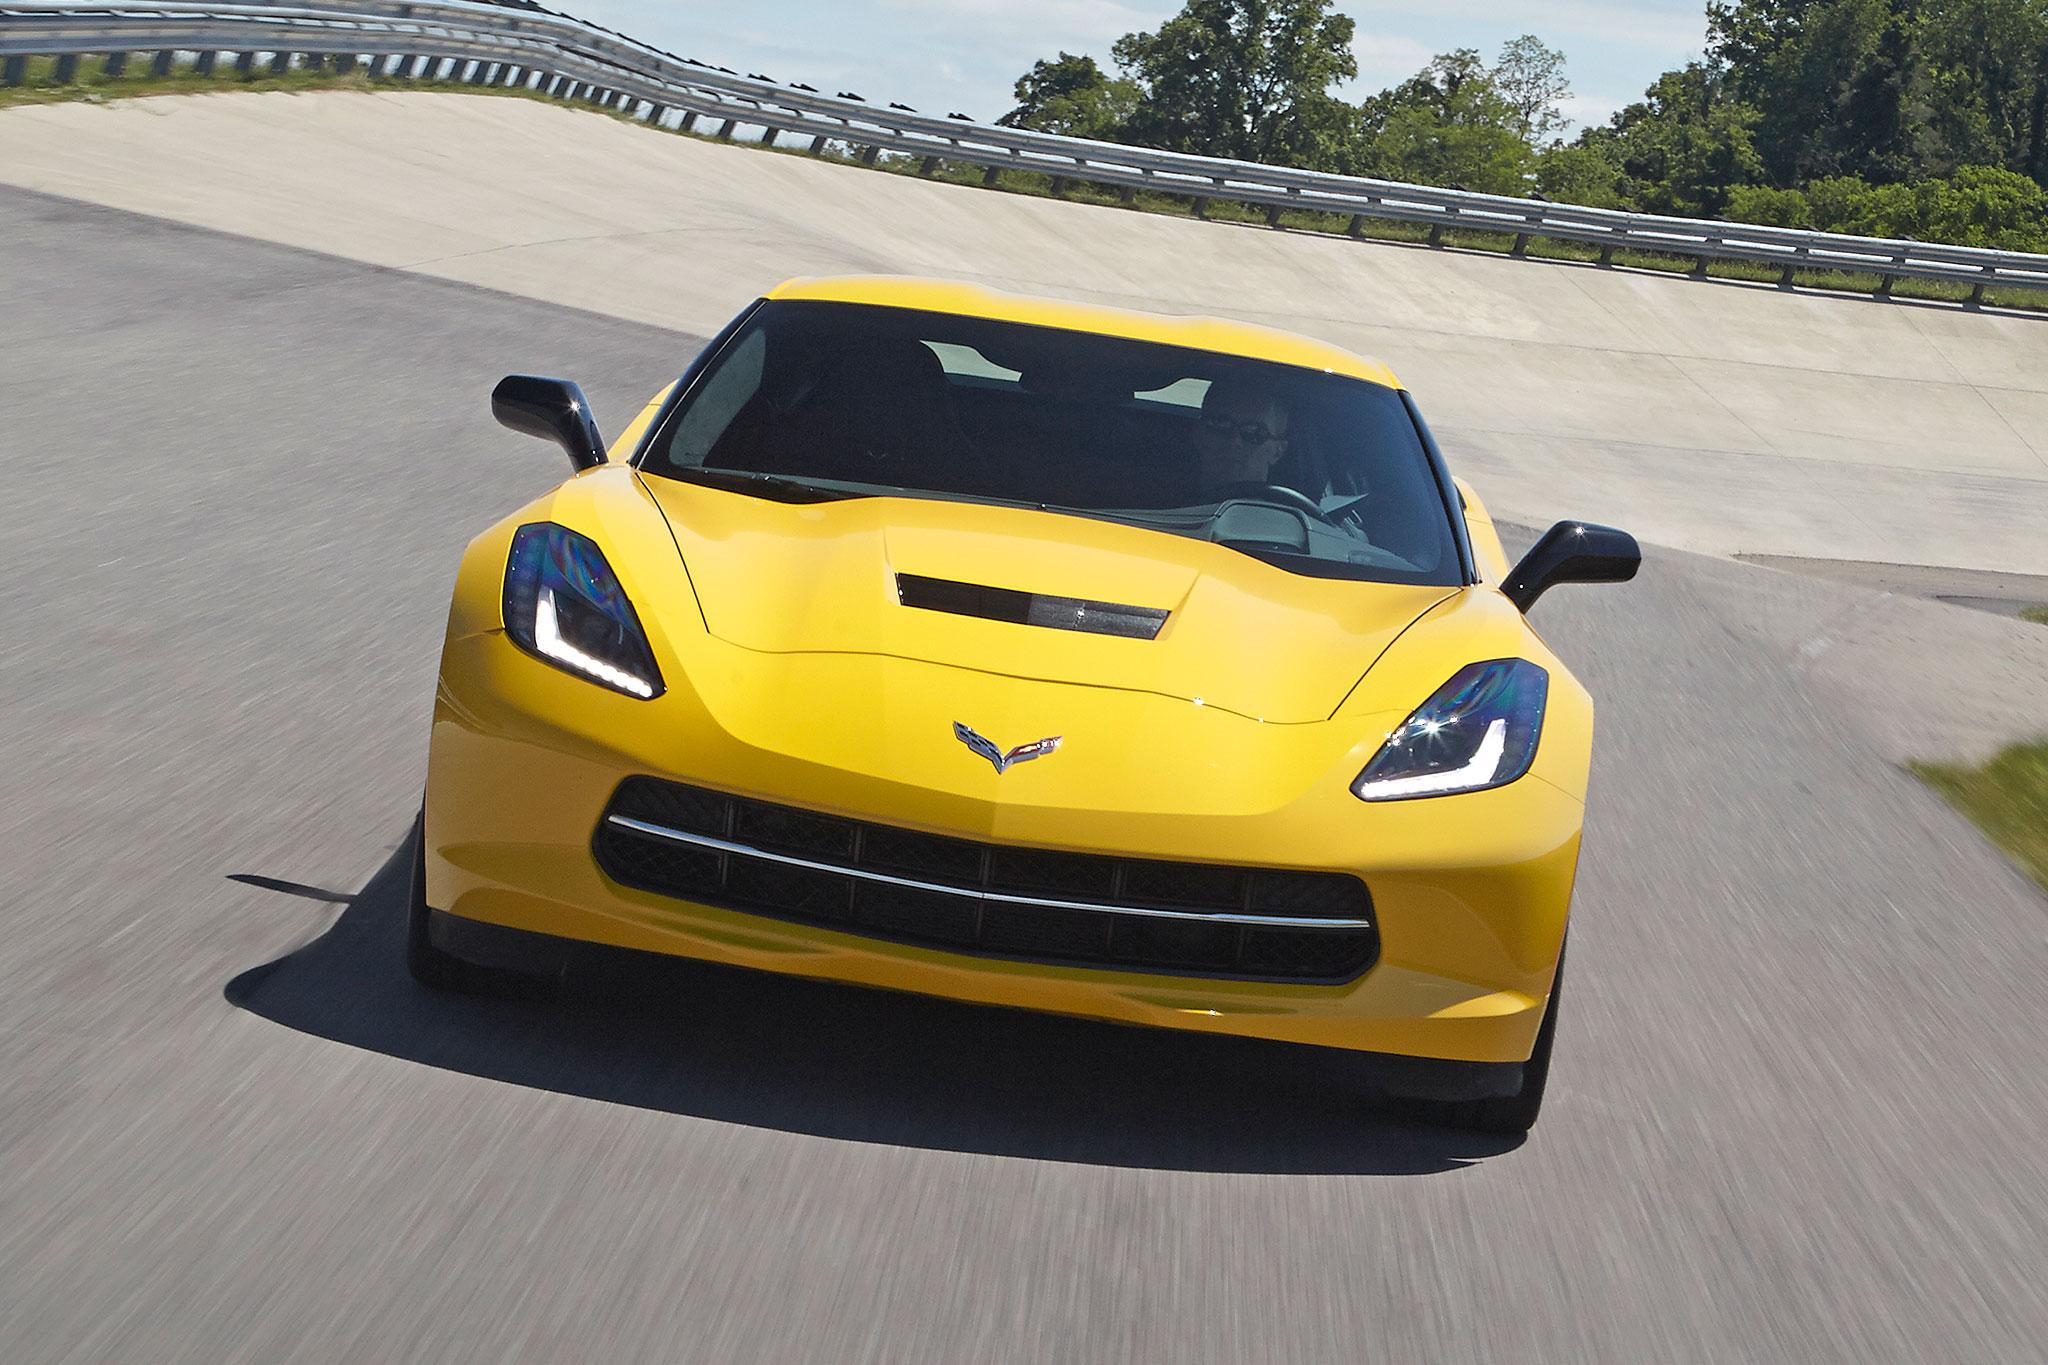 2015 Chevrolet Corvette Stingray Front View In Motion Track 1